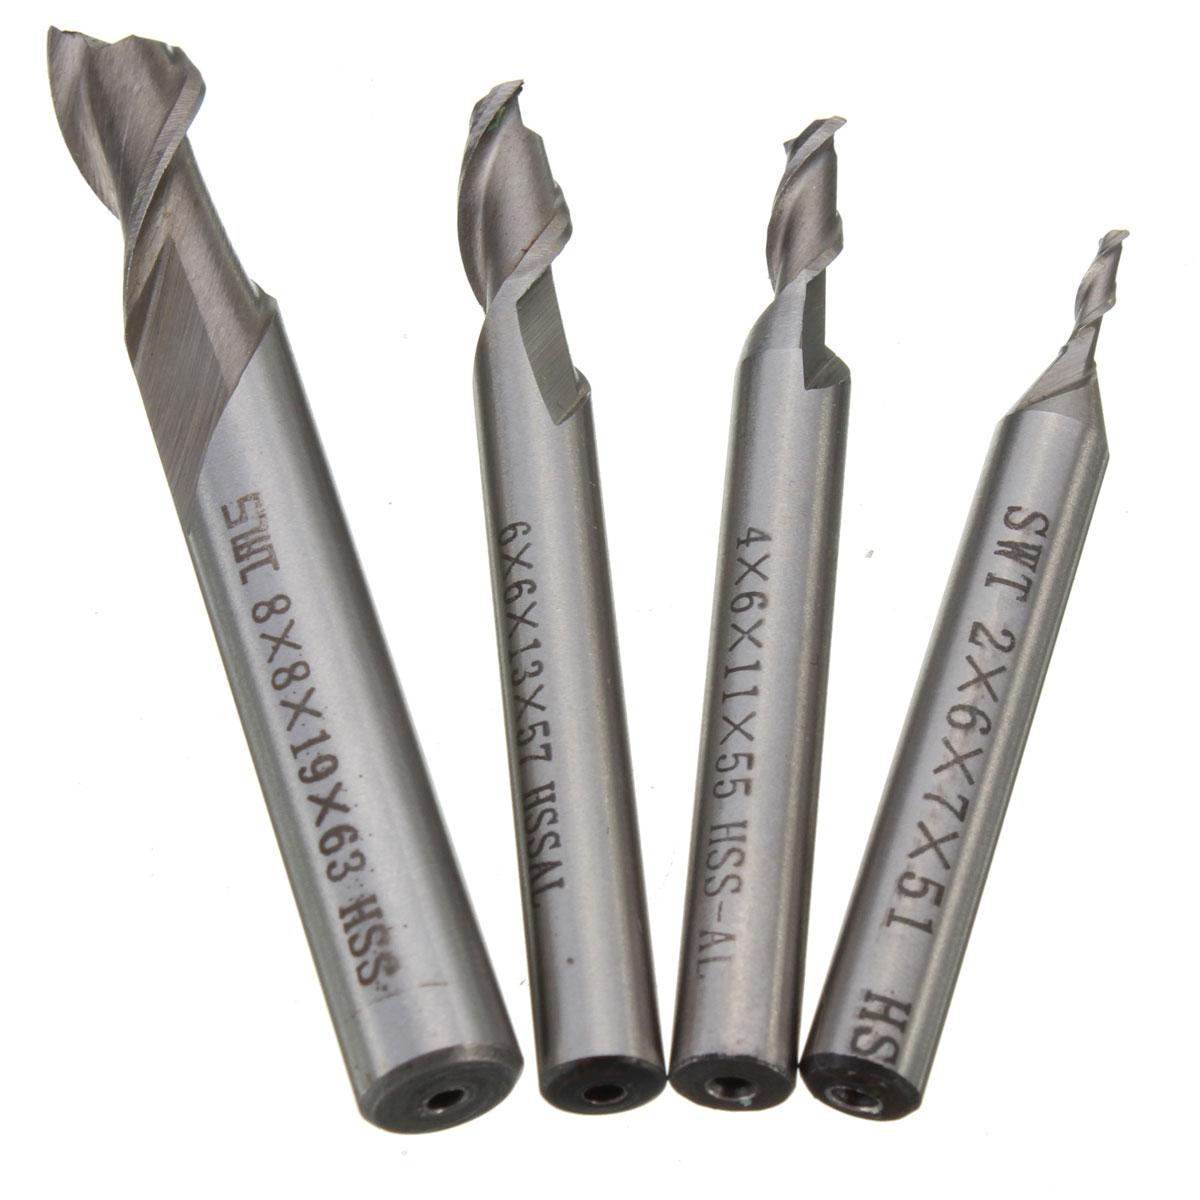 2 Flute HSS &amp; Aluminium End Milling Cutter CNC Bit 2mm-8mm Mills Engraving Tools High Quality<br><br>Aliexpress